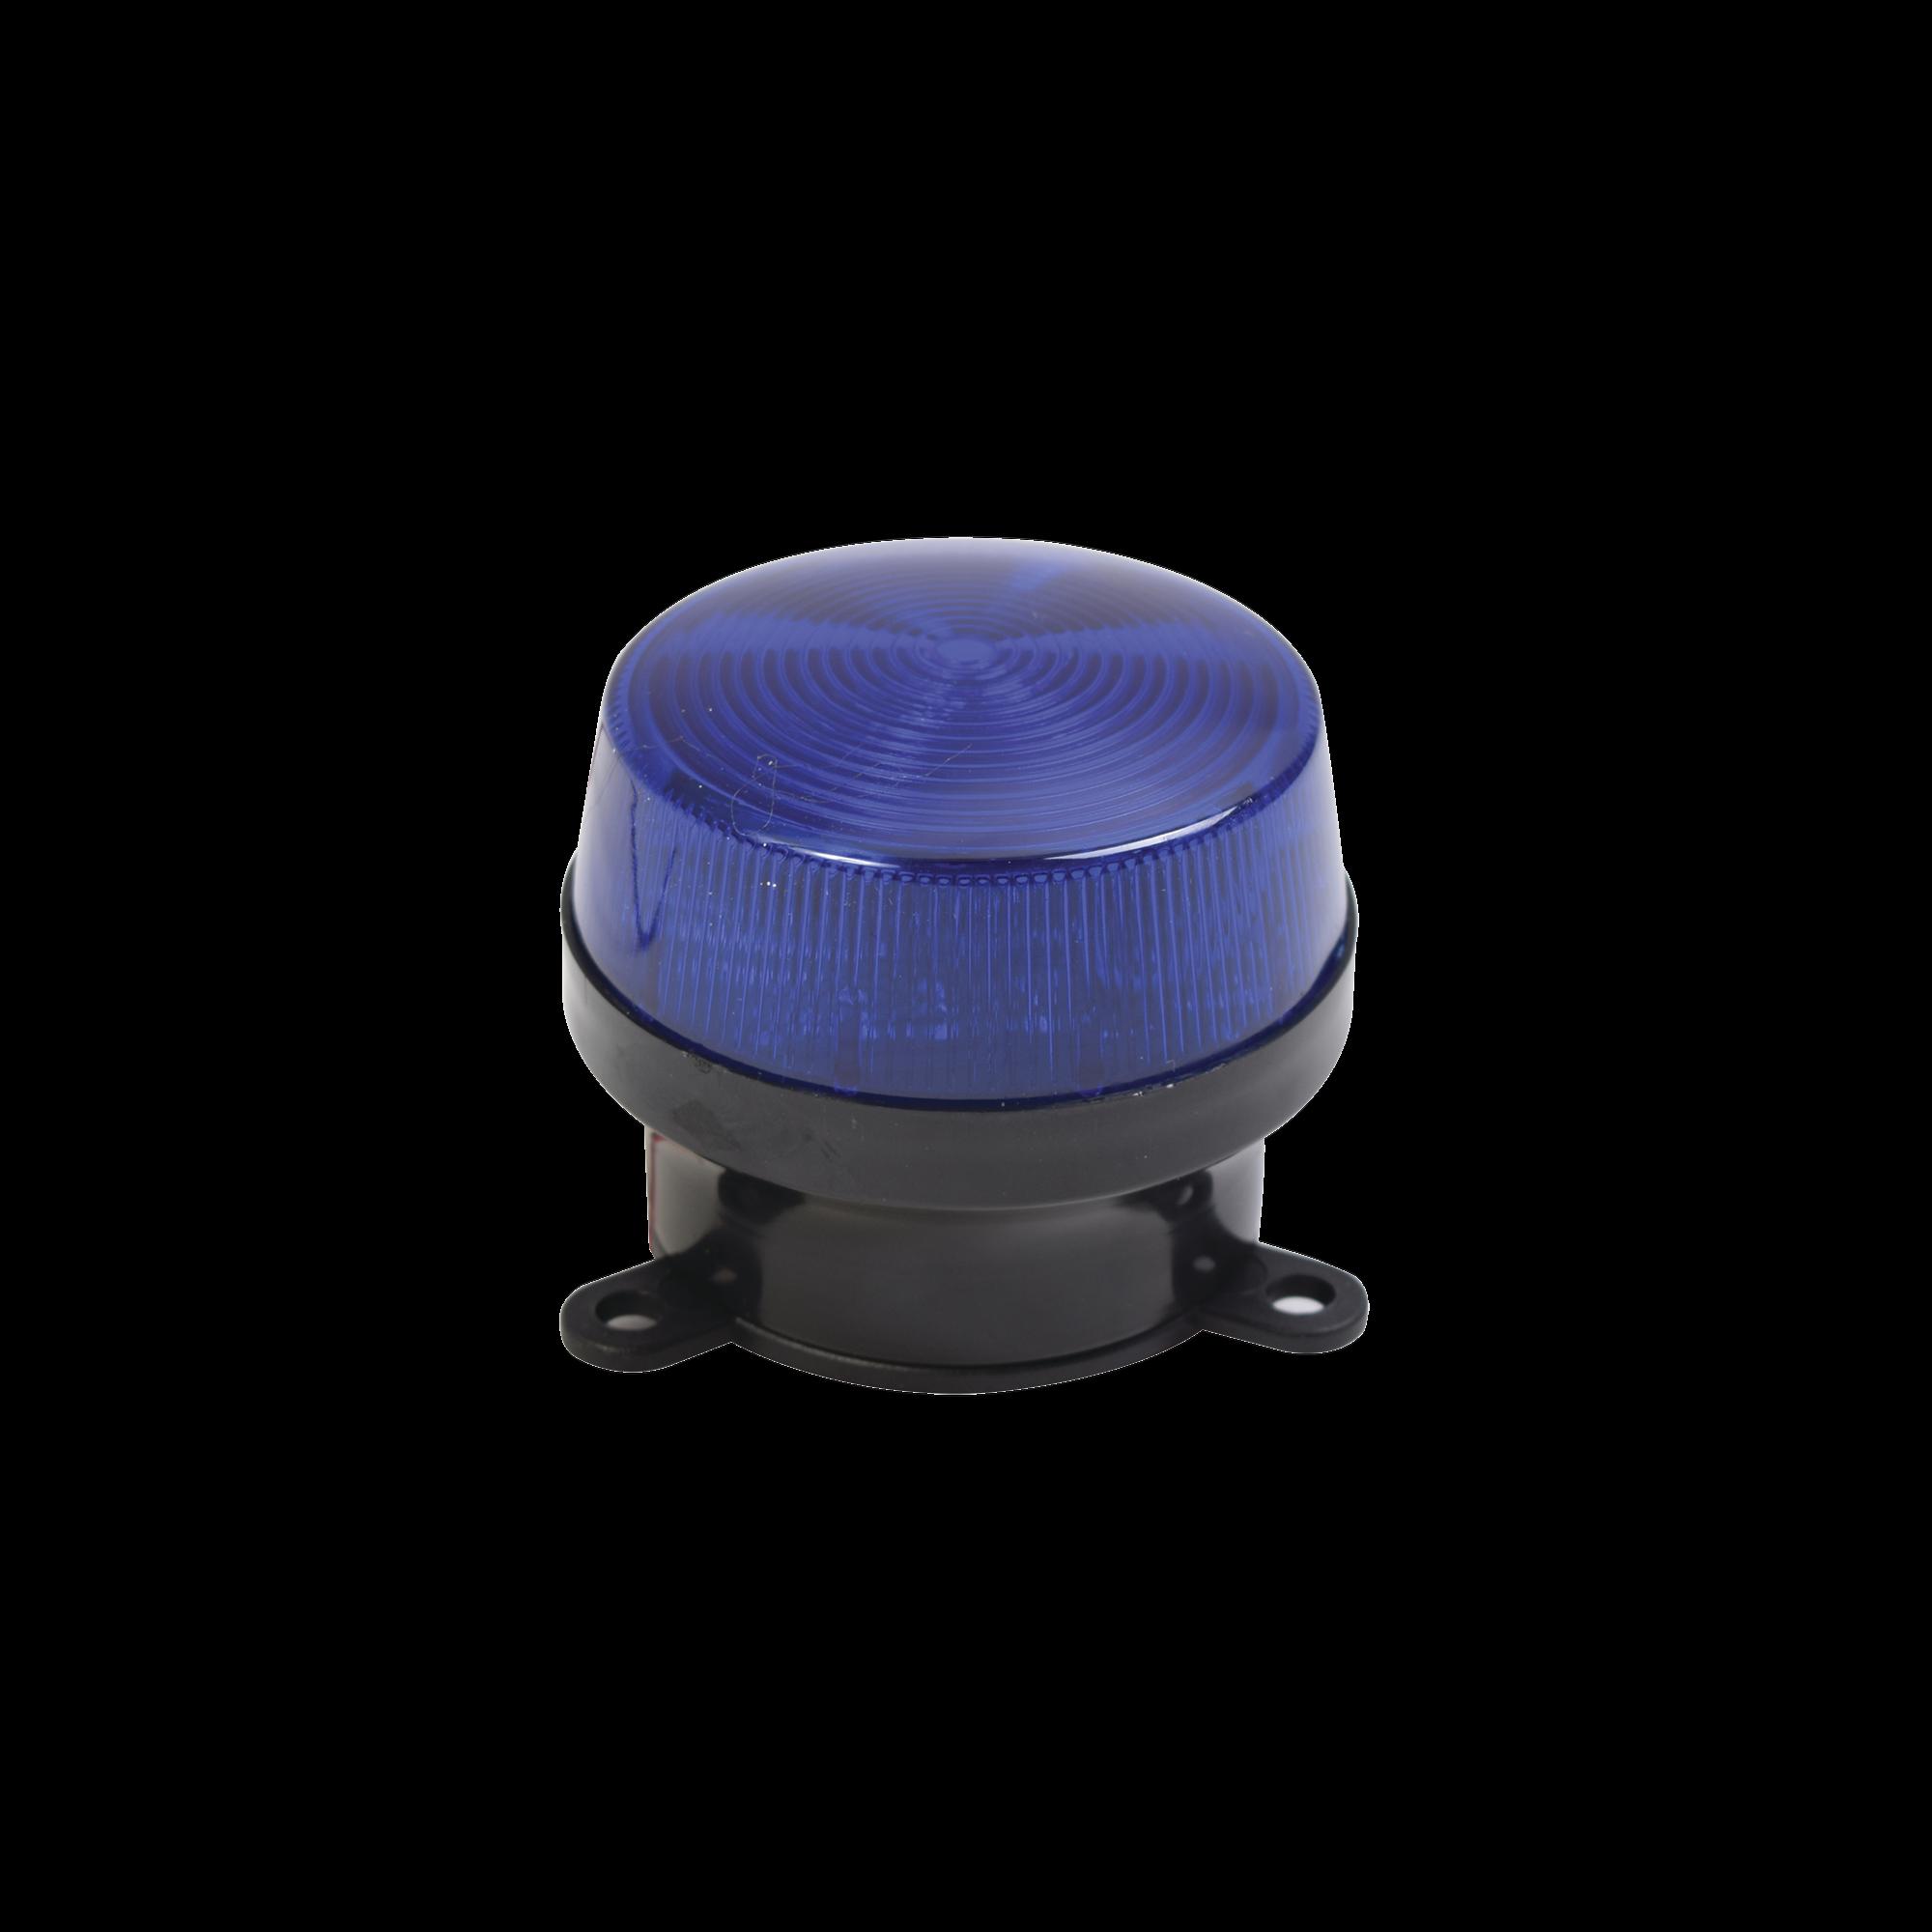 Mini estrobo color azul con montaje de pestaña.